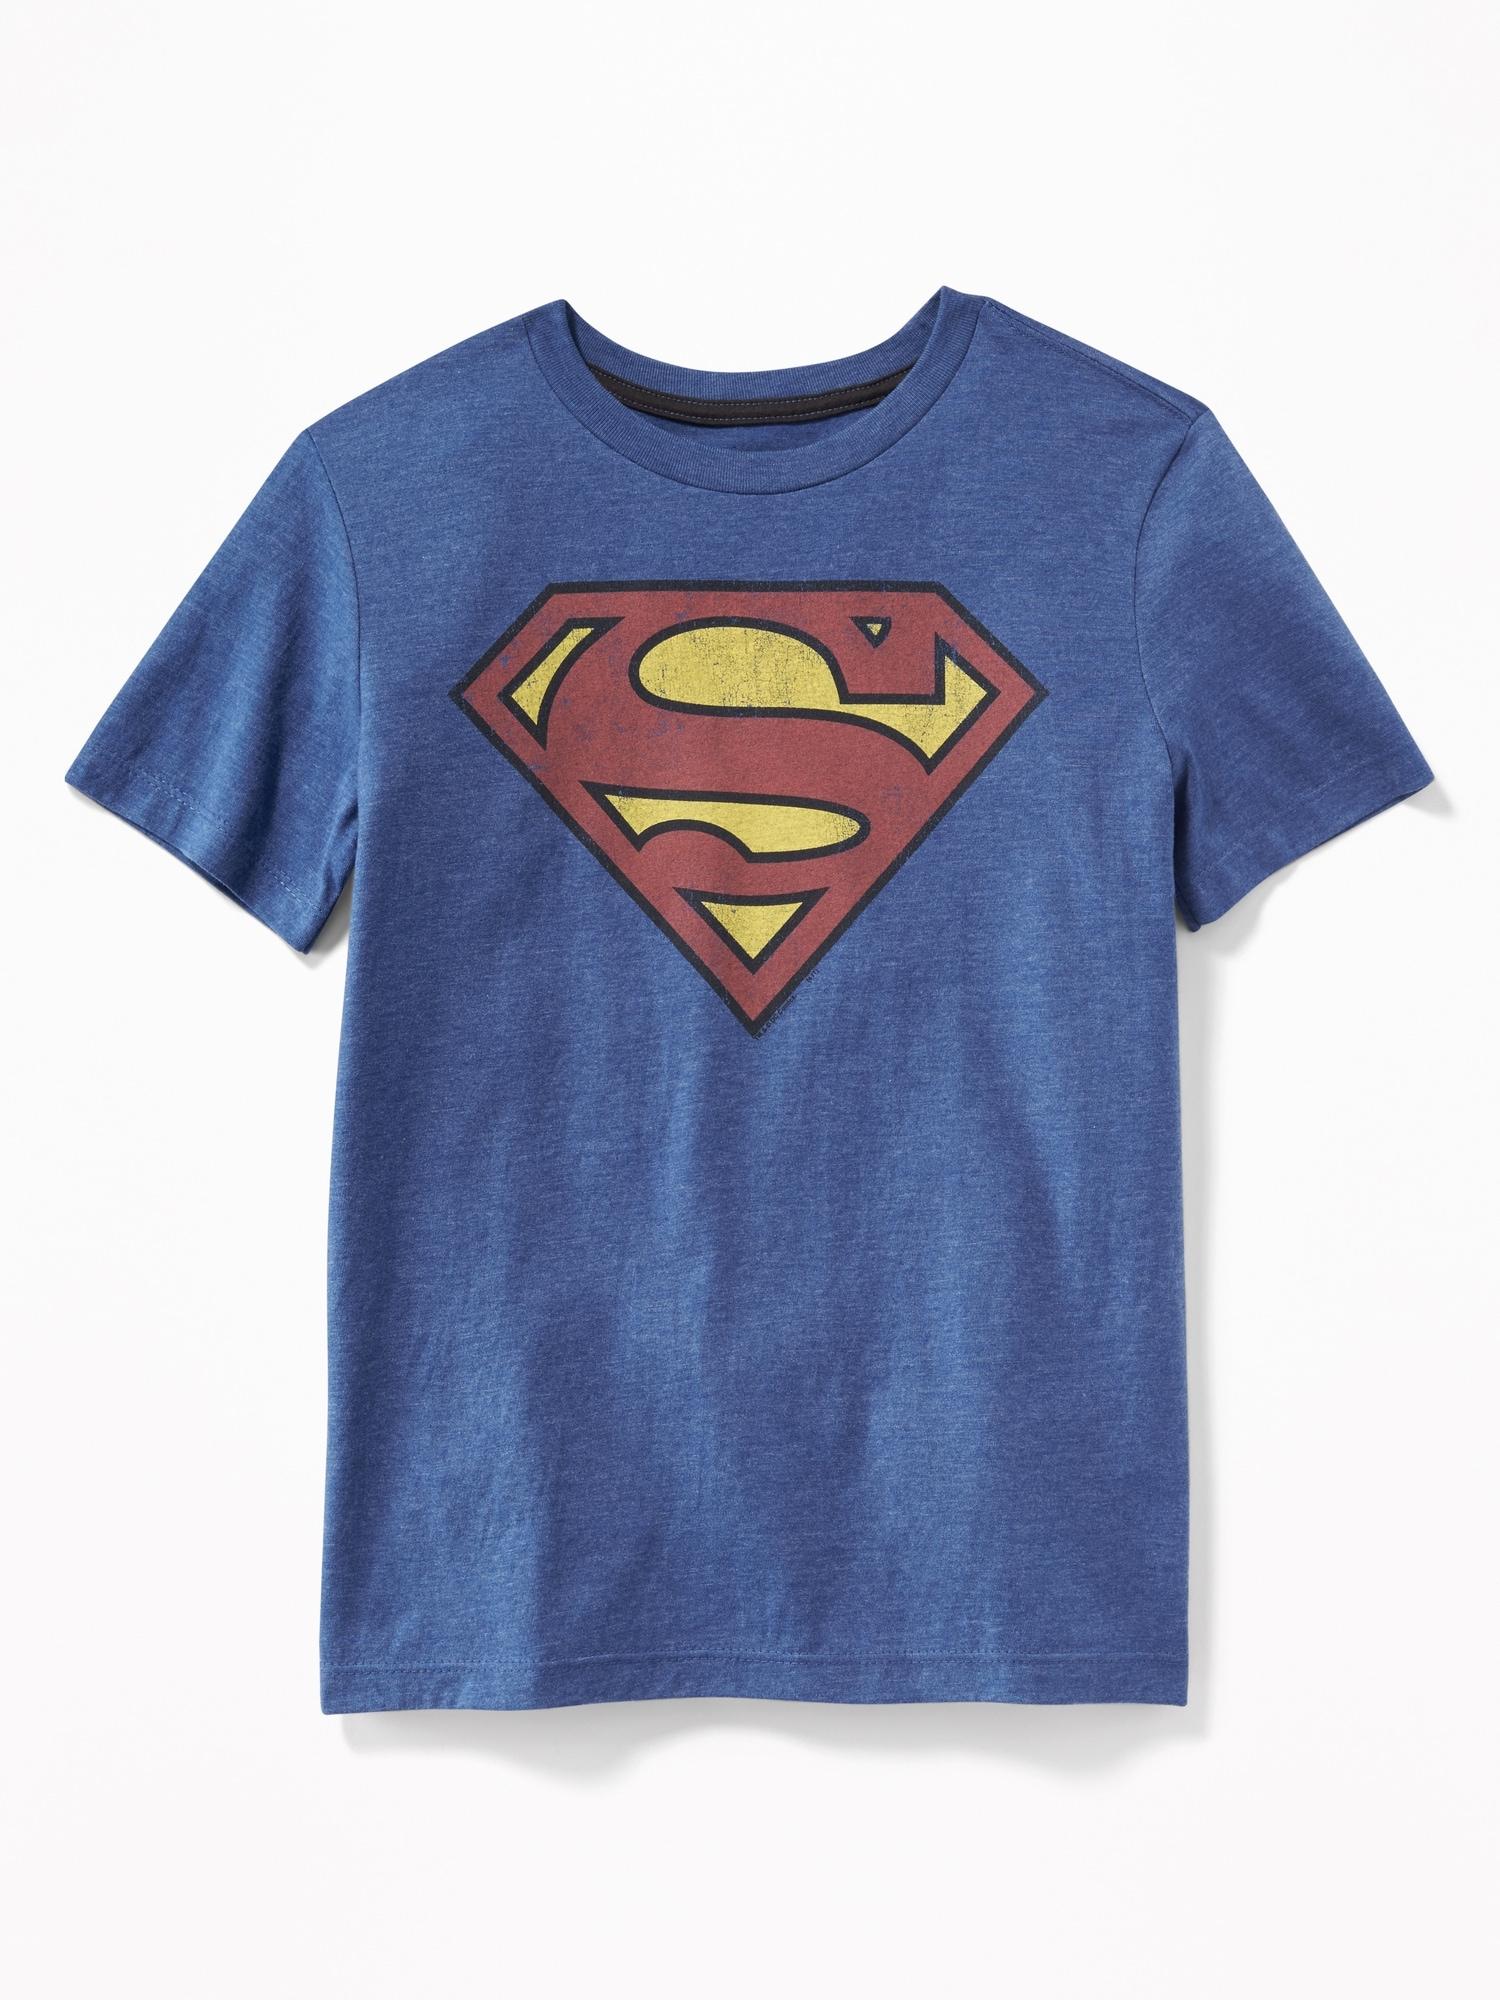 5e8339bc6f5 Boys DC Comics™ Superman Tees